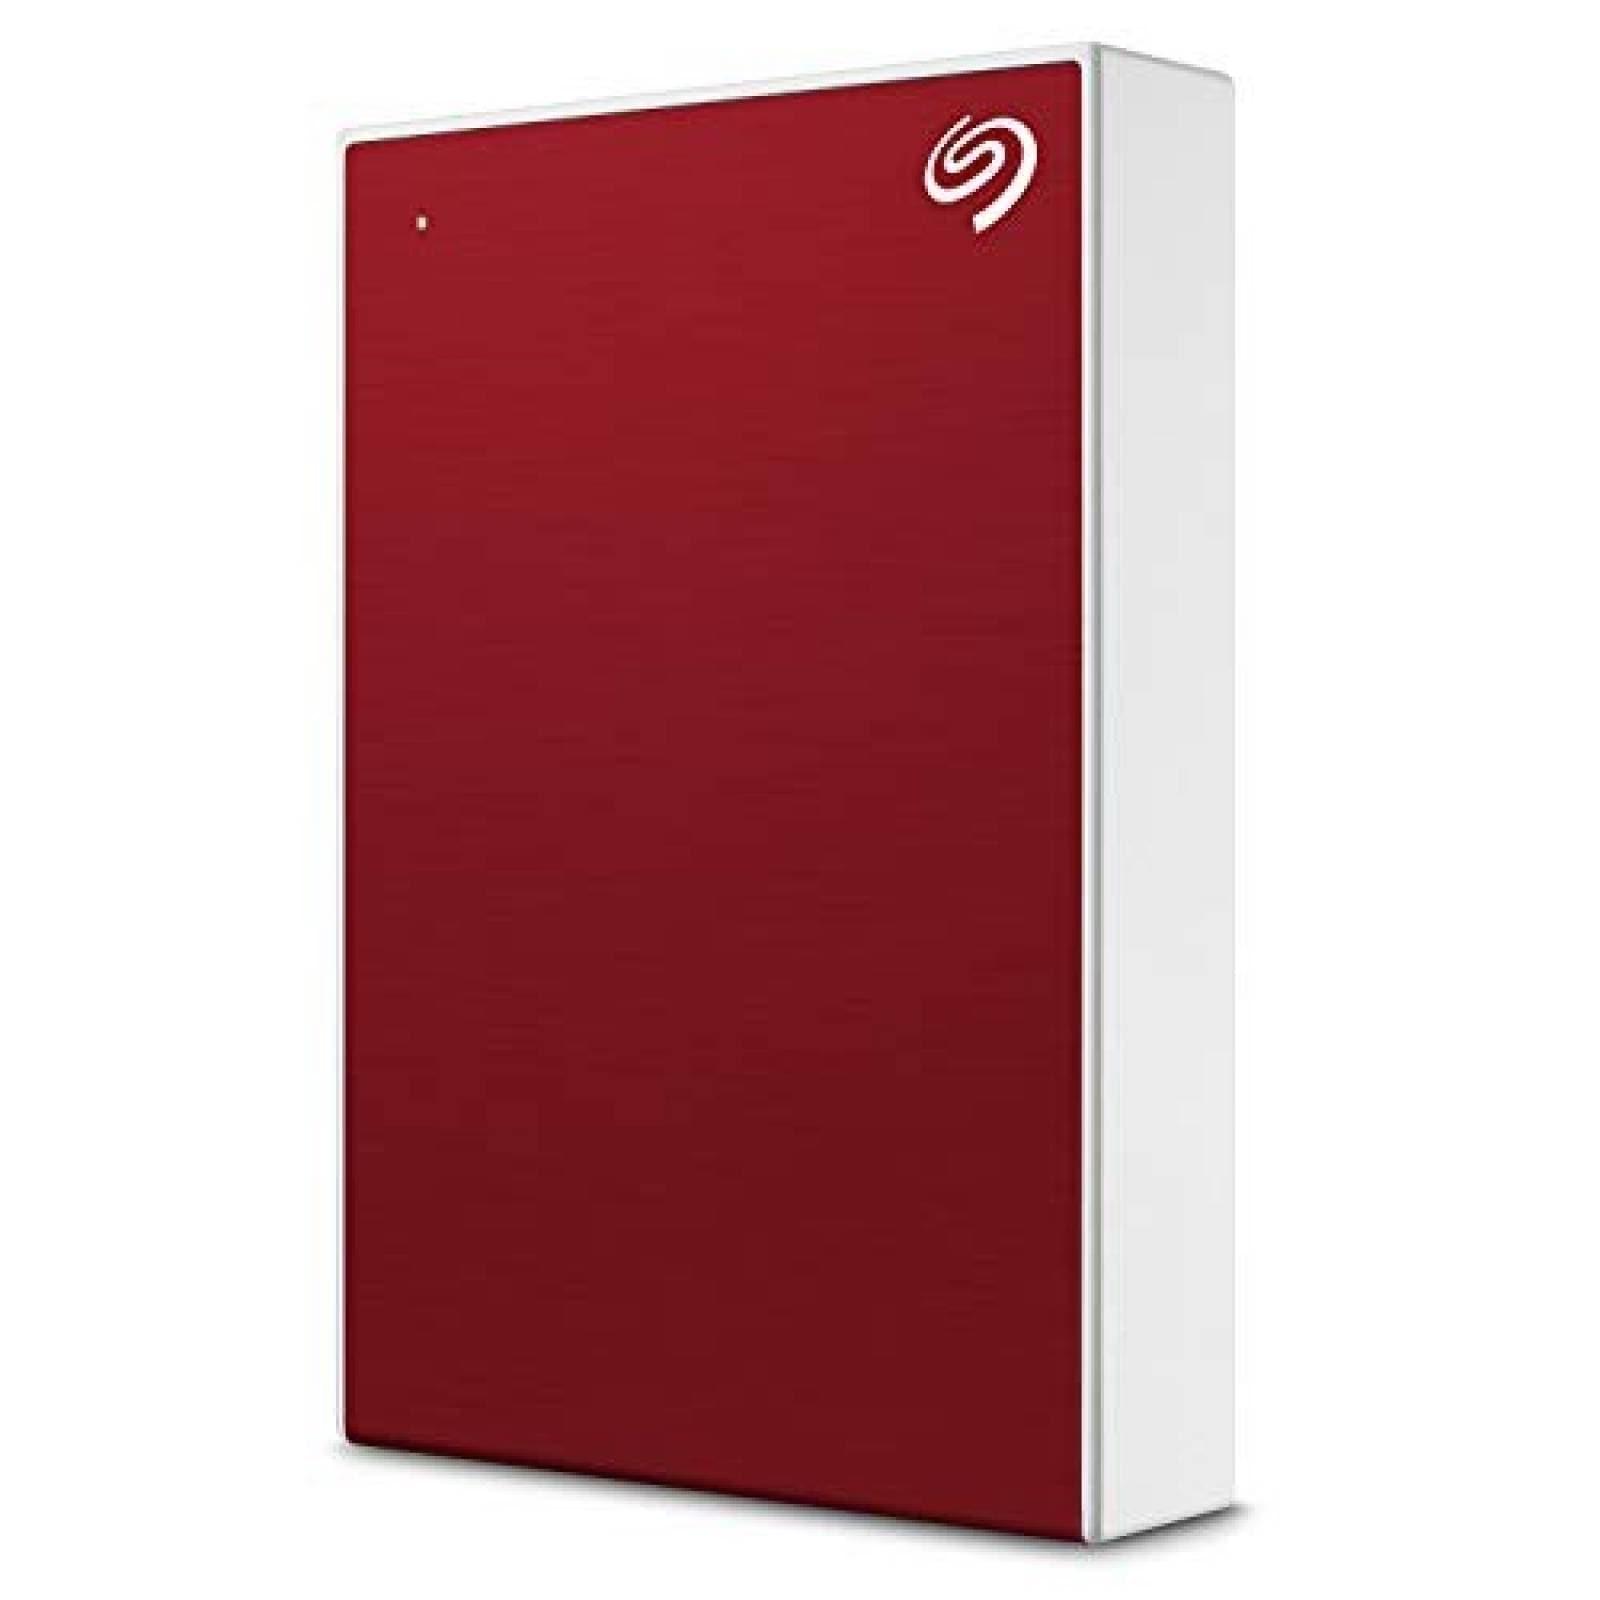 Disco duro externo Seagate Backup Plus 4TB -rojo